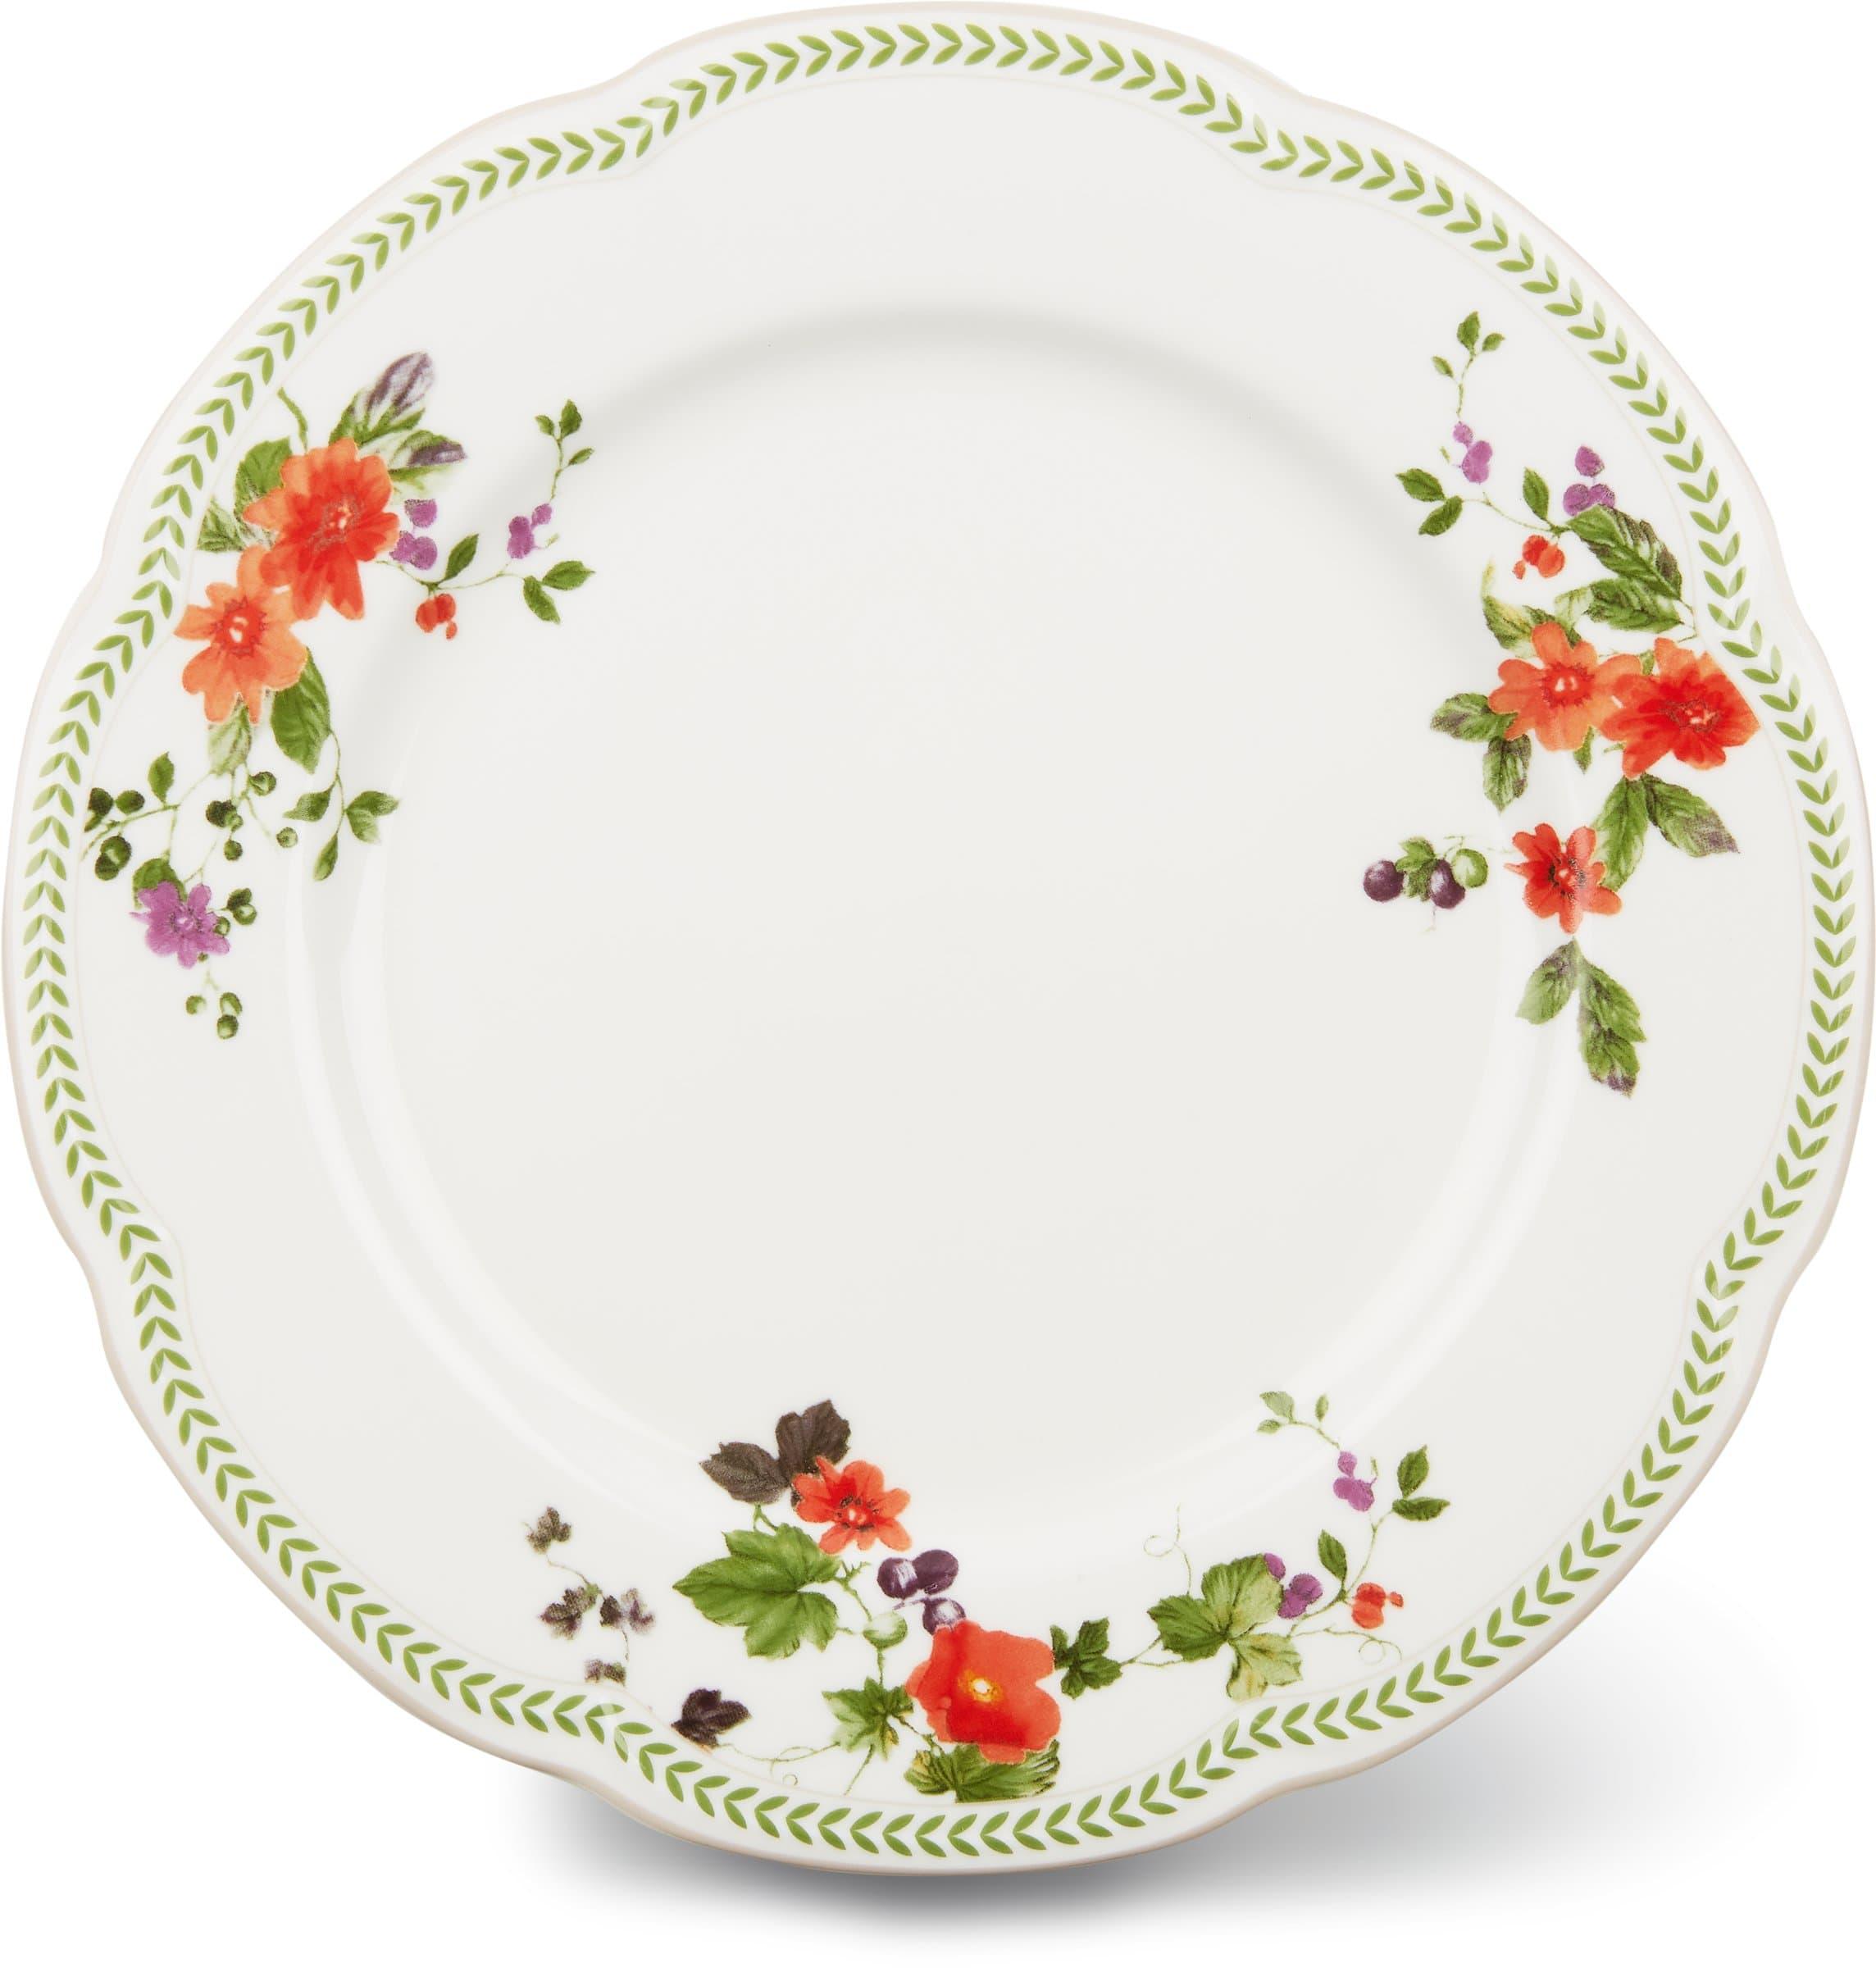 Cucina & Tavola LANDHAUS Assiette plate